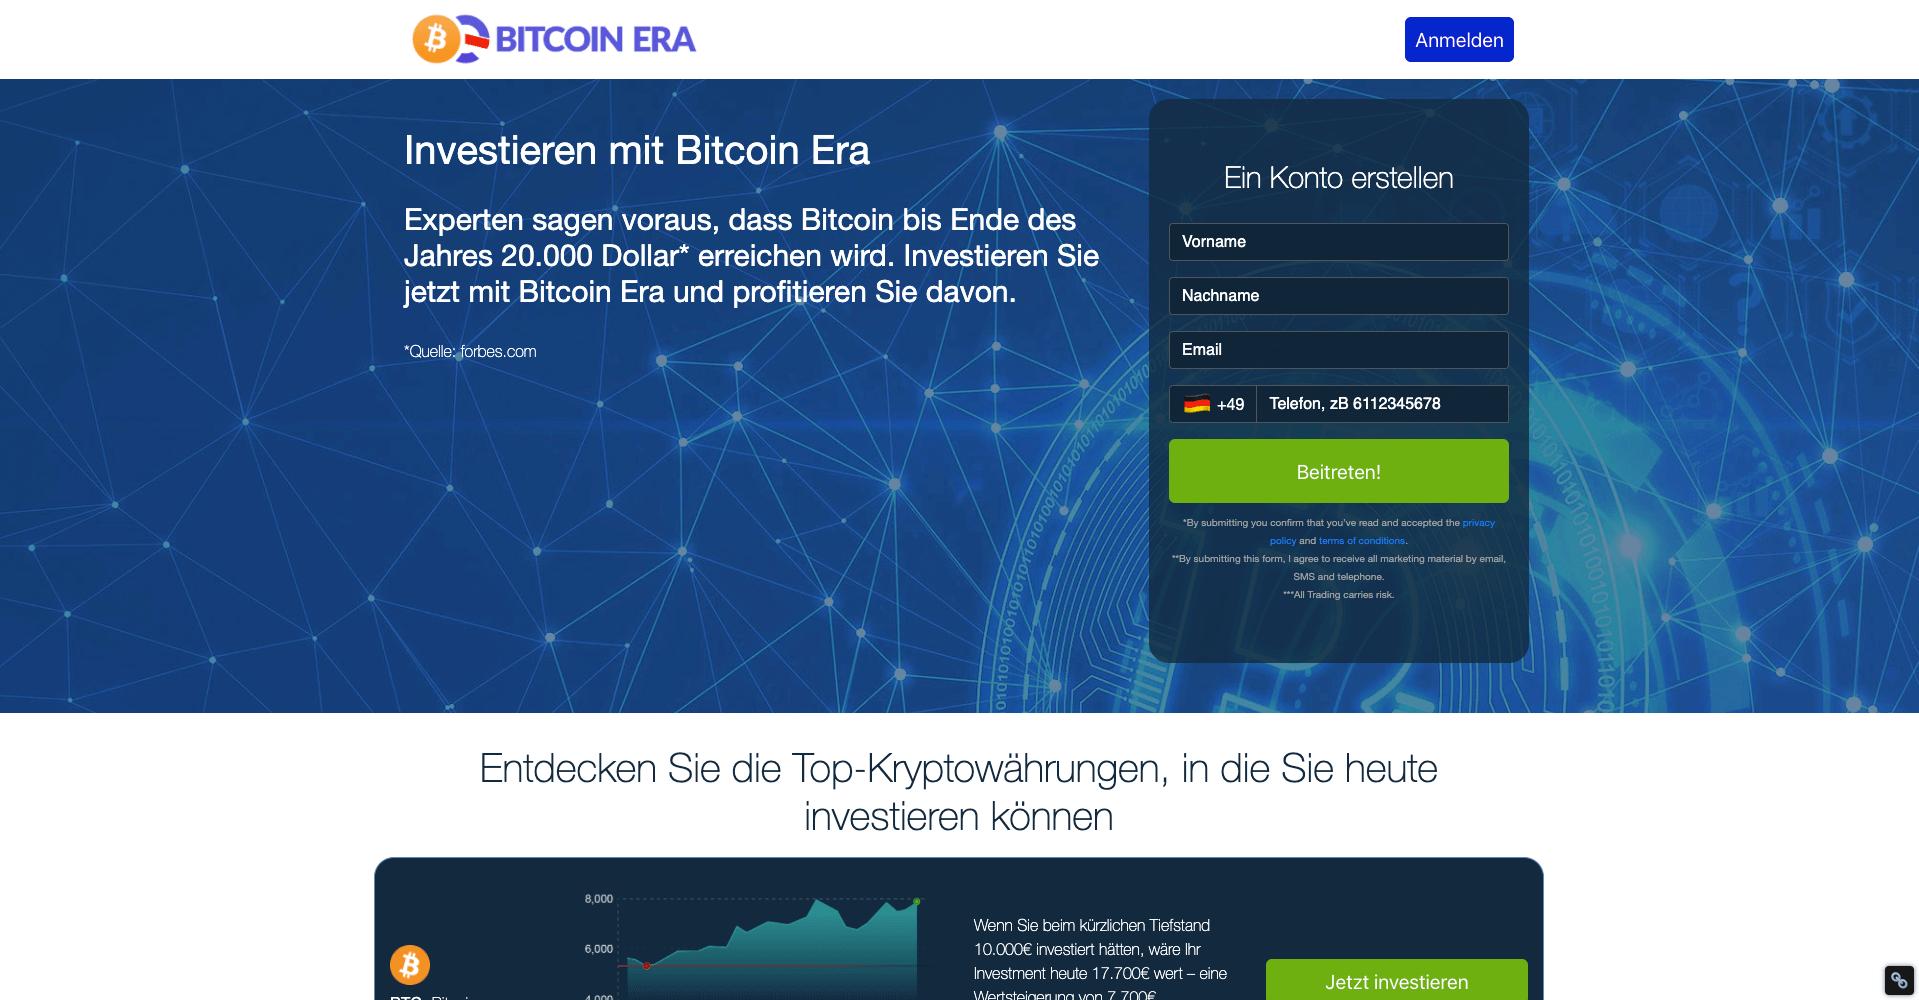 Enregistrement Bitcoin Era